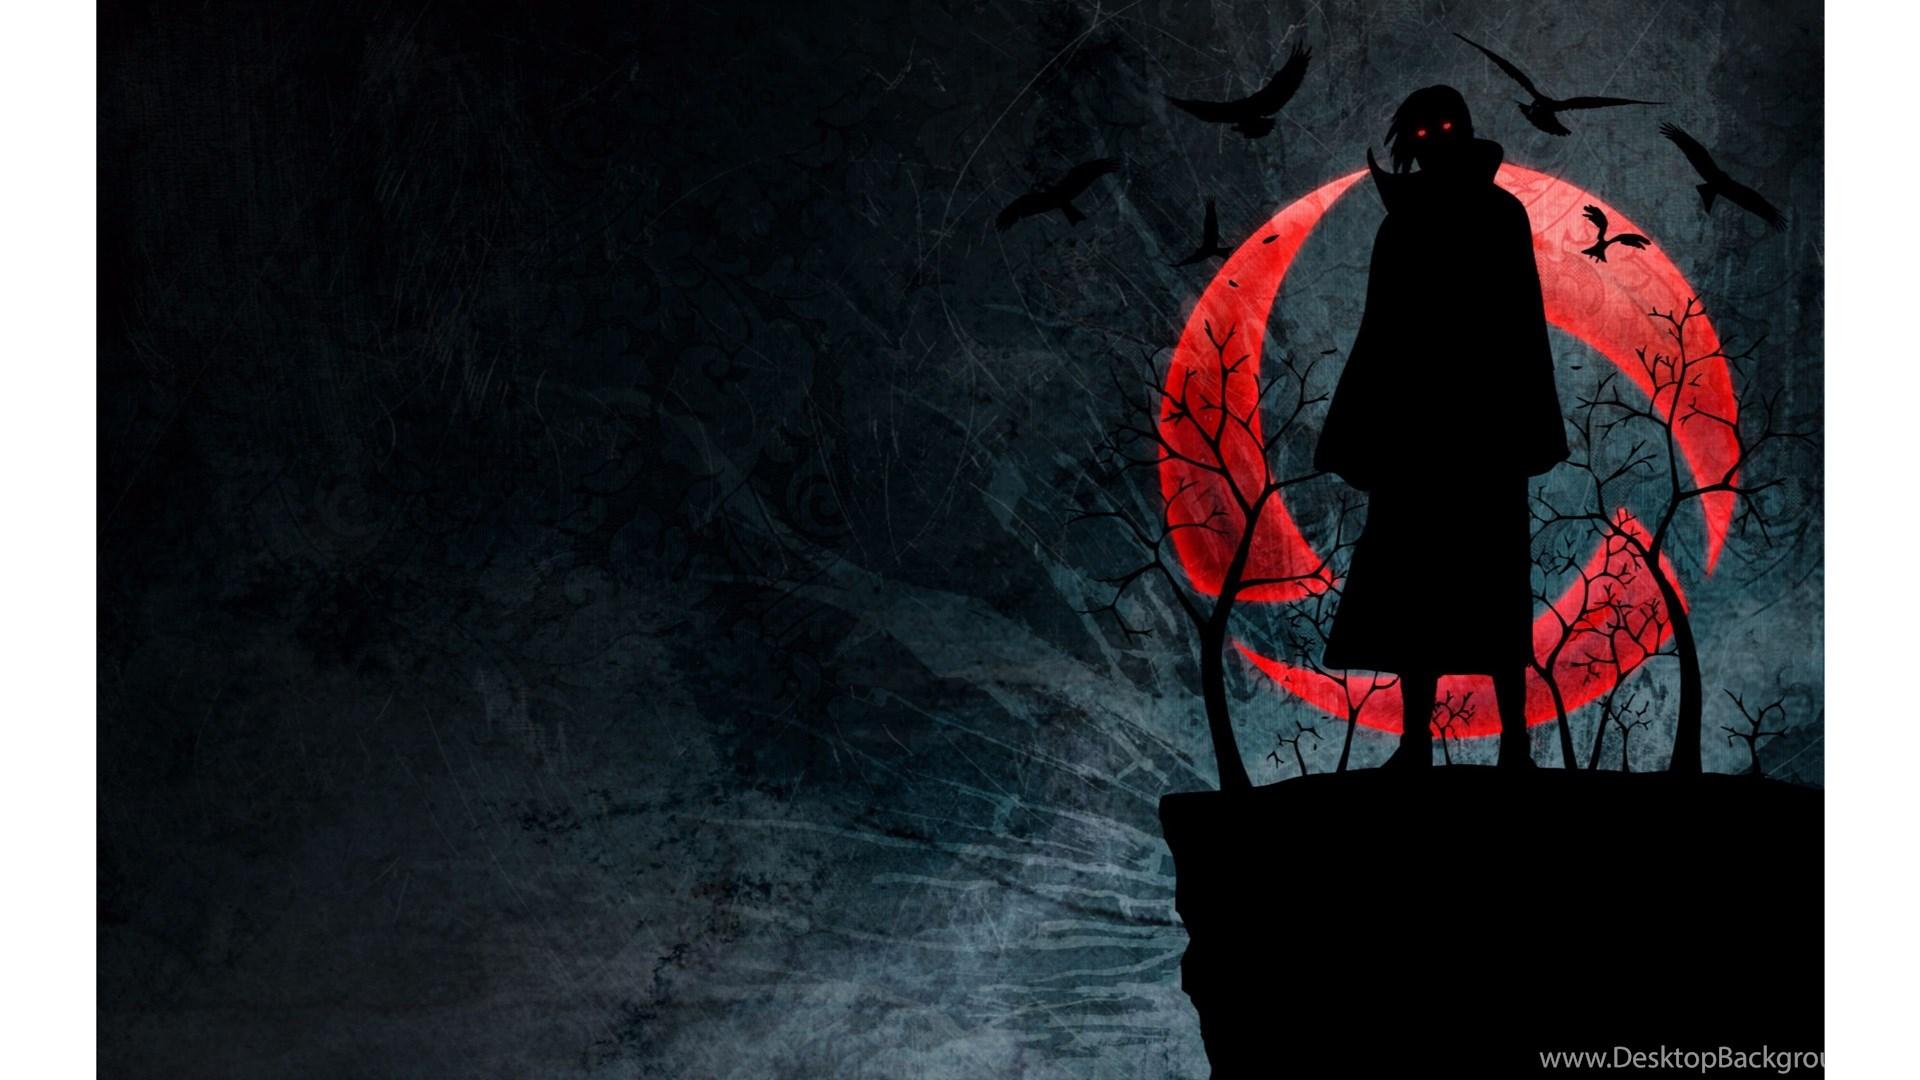 Scary night 4k anime wallpapers desktop background - Anime wallpaper 4k ...